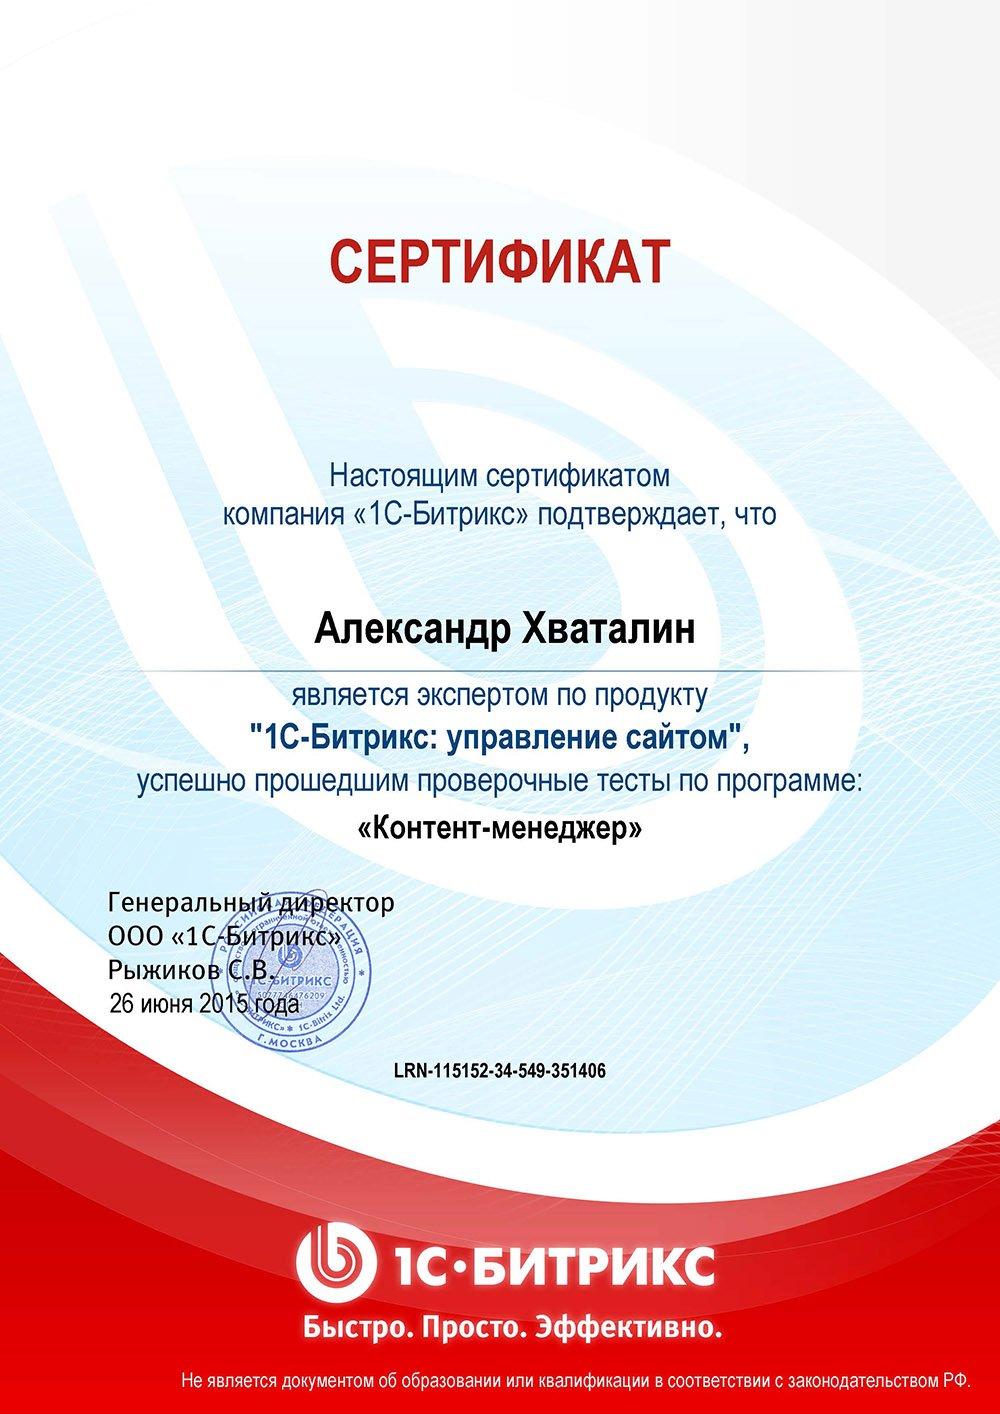 Александр Хваталин. Сертифицированный специалист. «Контент-менеджер» 1С-Битрикс